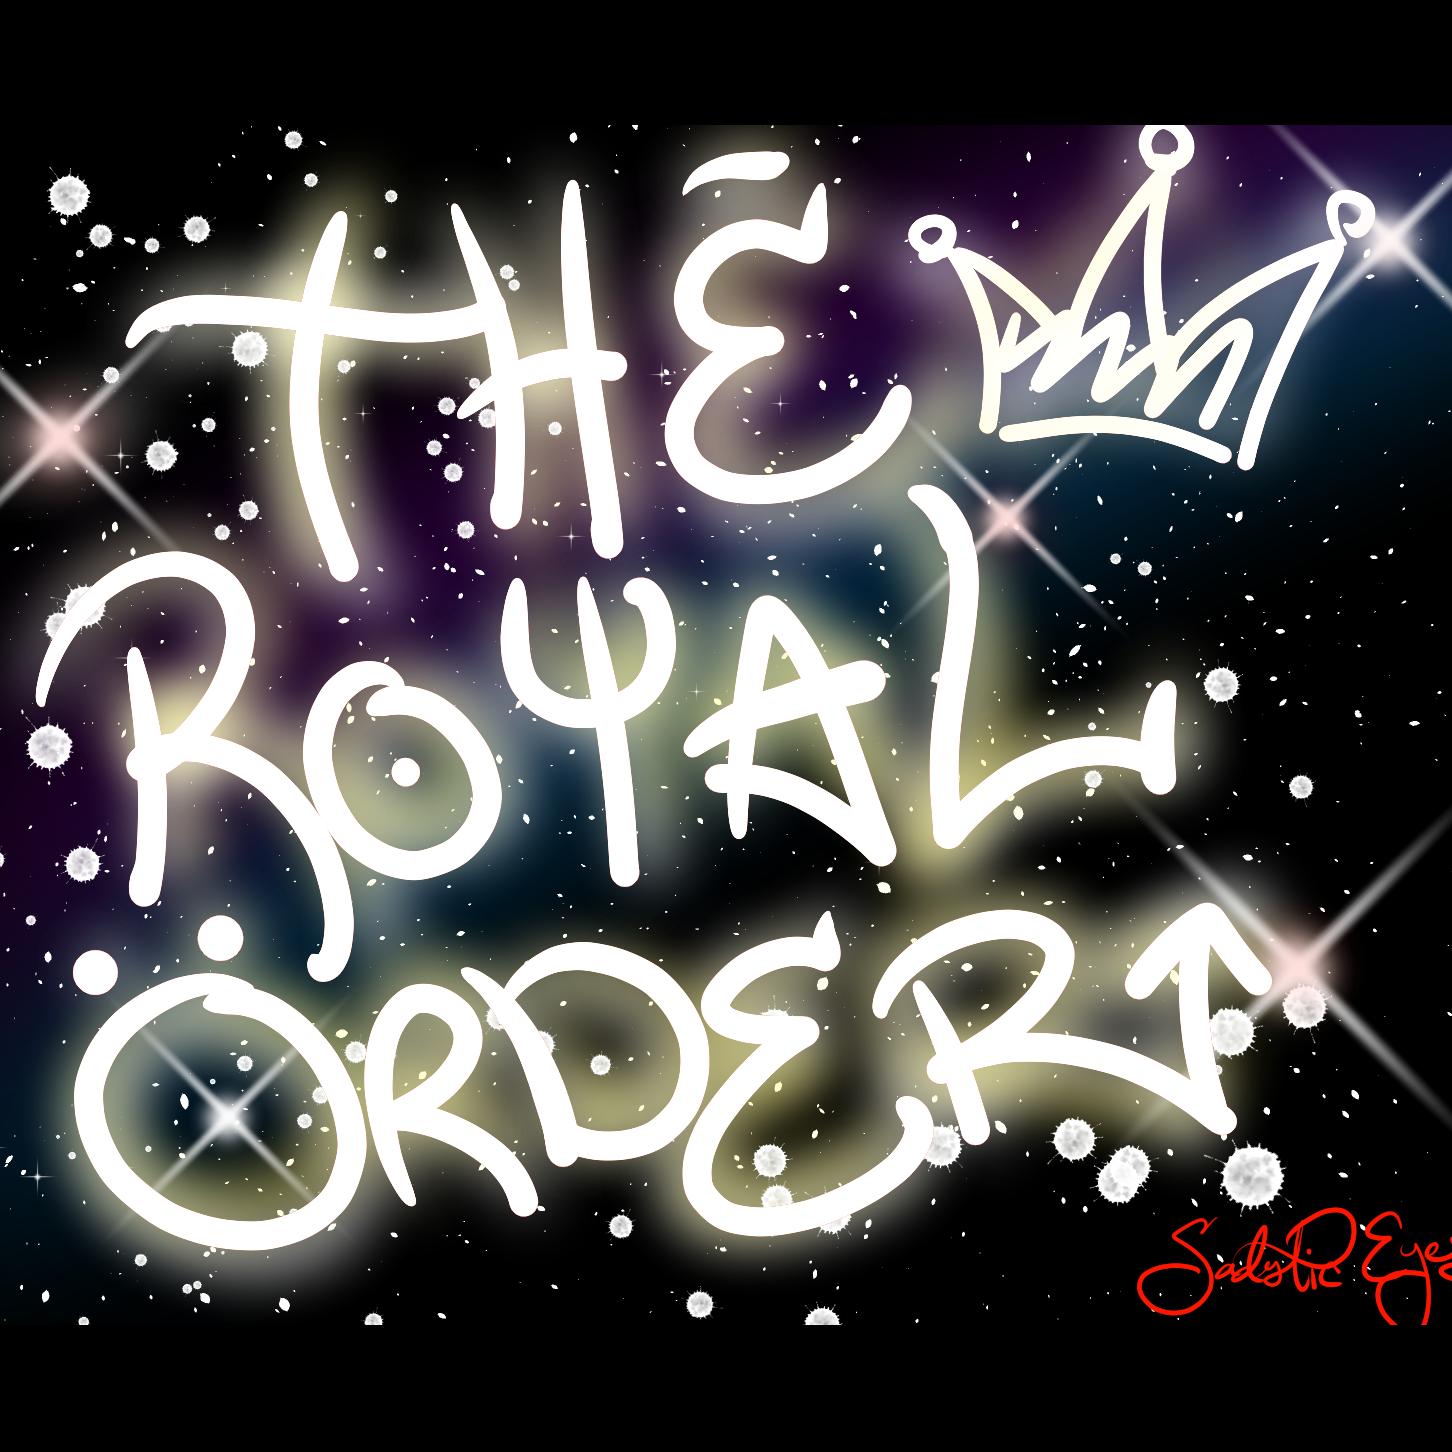 The Royal Order FM